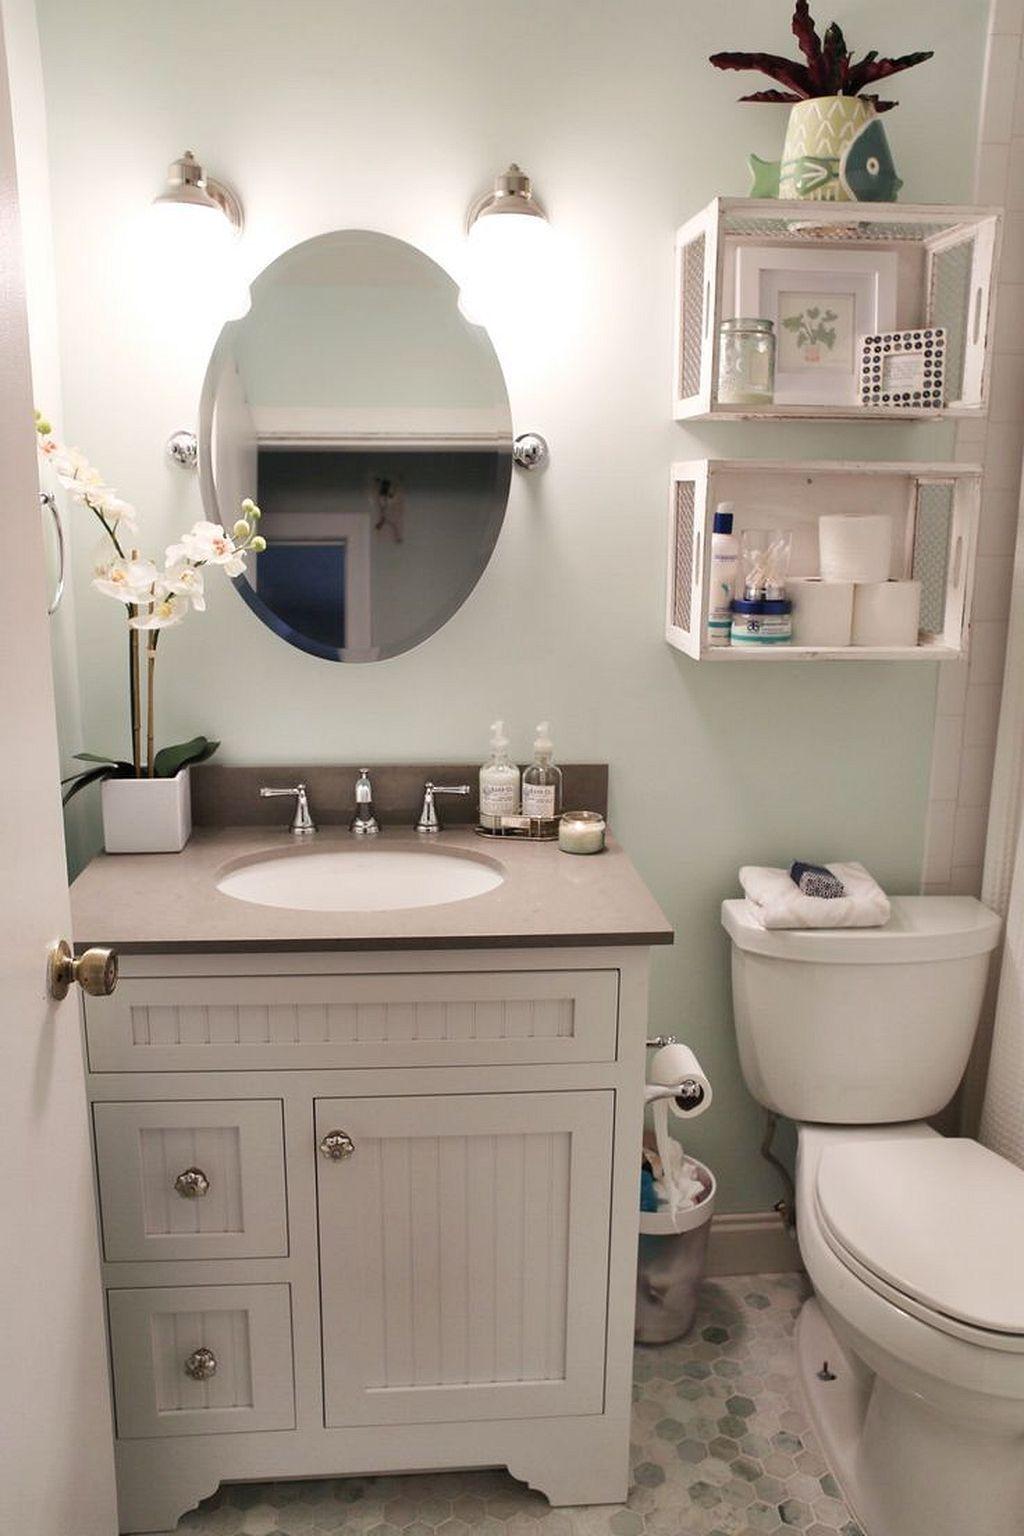 tiny bathroom makeover ideas on a budget 39 small on bathroom renovation ideas on a budget id=60893